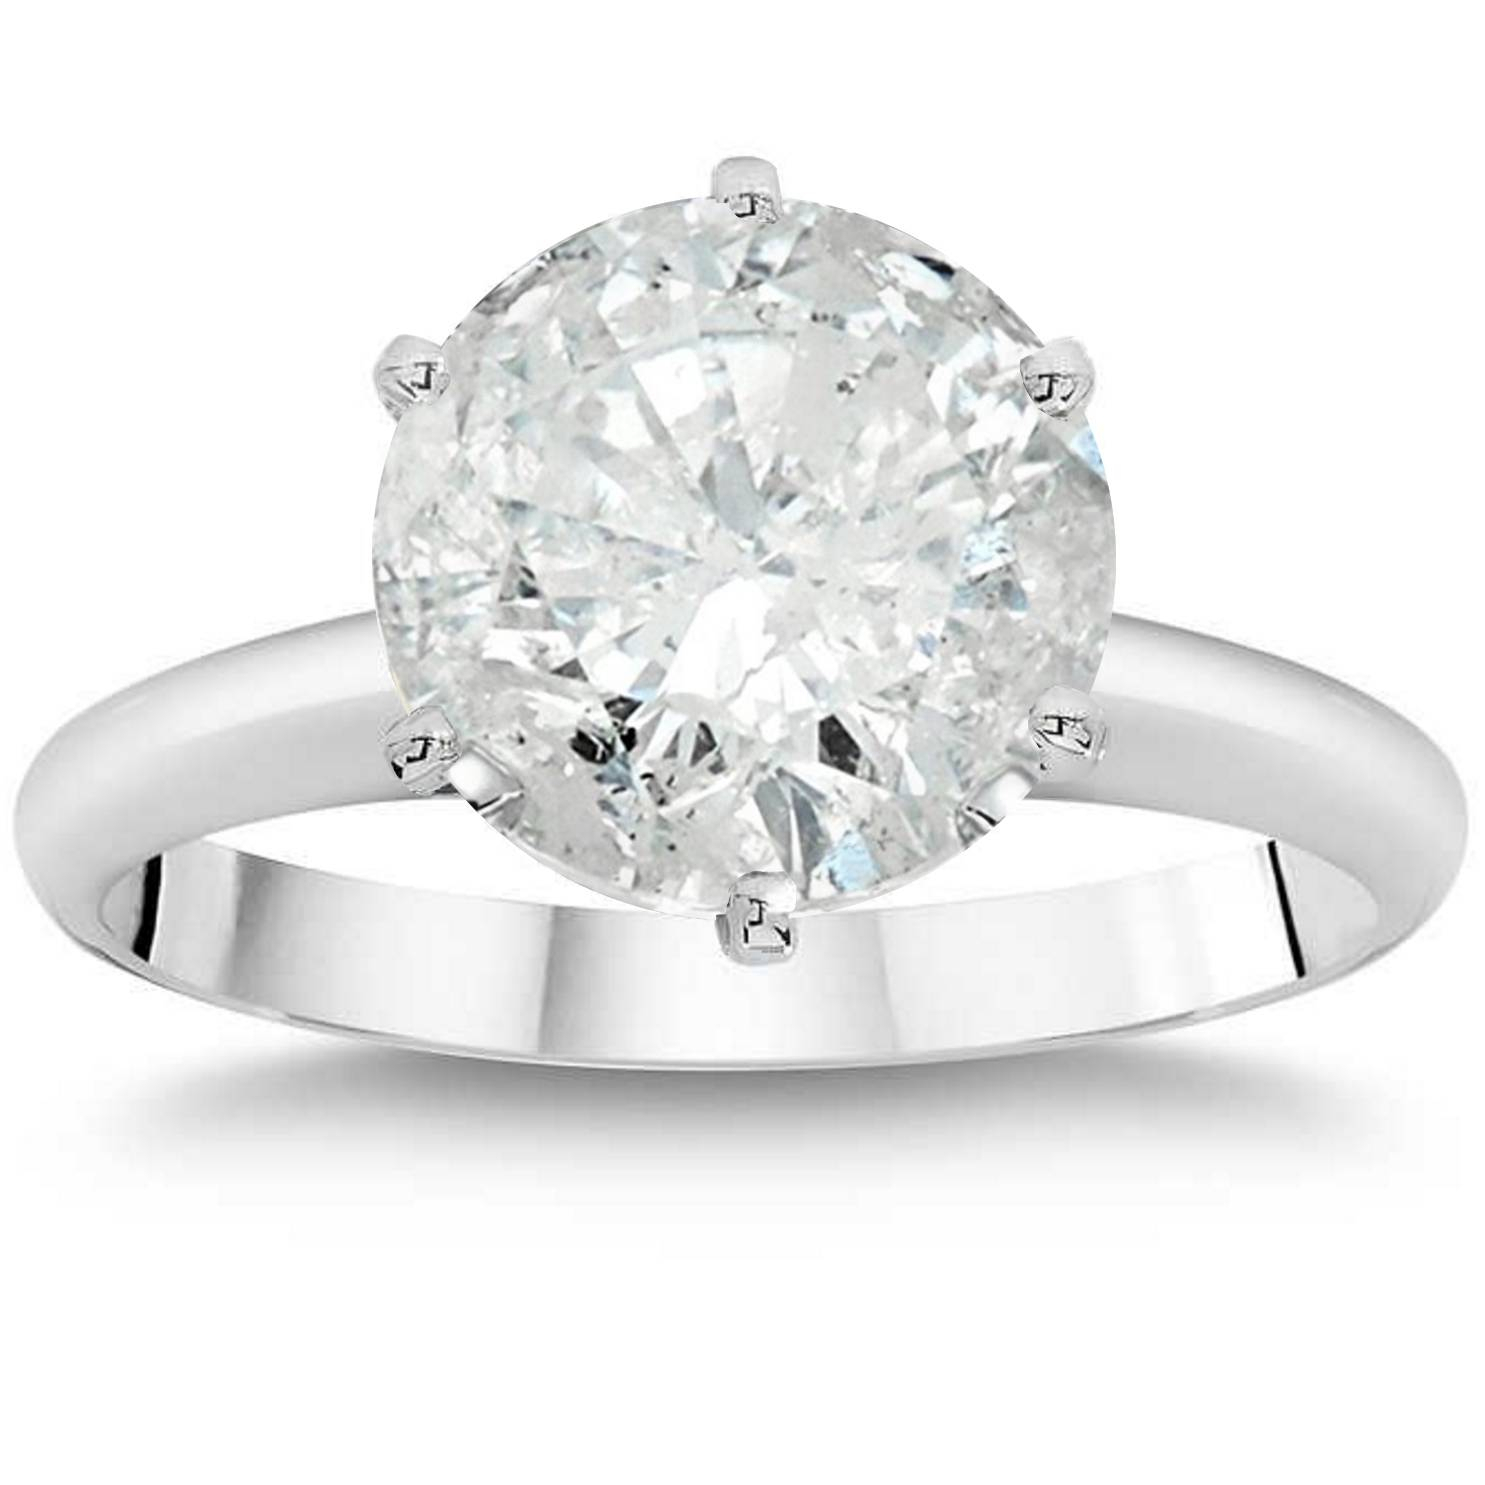 Pompeii3: 3ct Round Brilliant Diamond Solitaire Engagement Ring 14k White Gold Enhanced | Rakuten In Round Brilliant Diamond Engagement Rings (View 18 of 25)